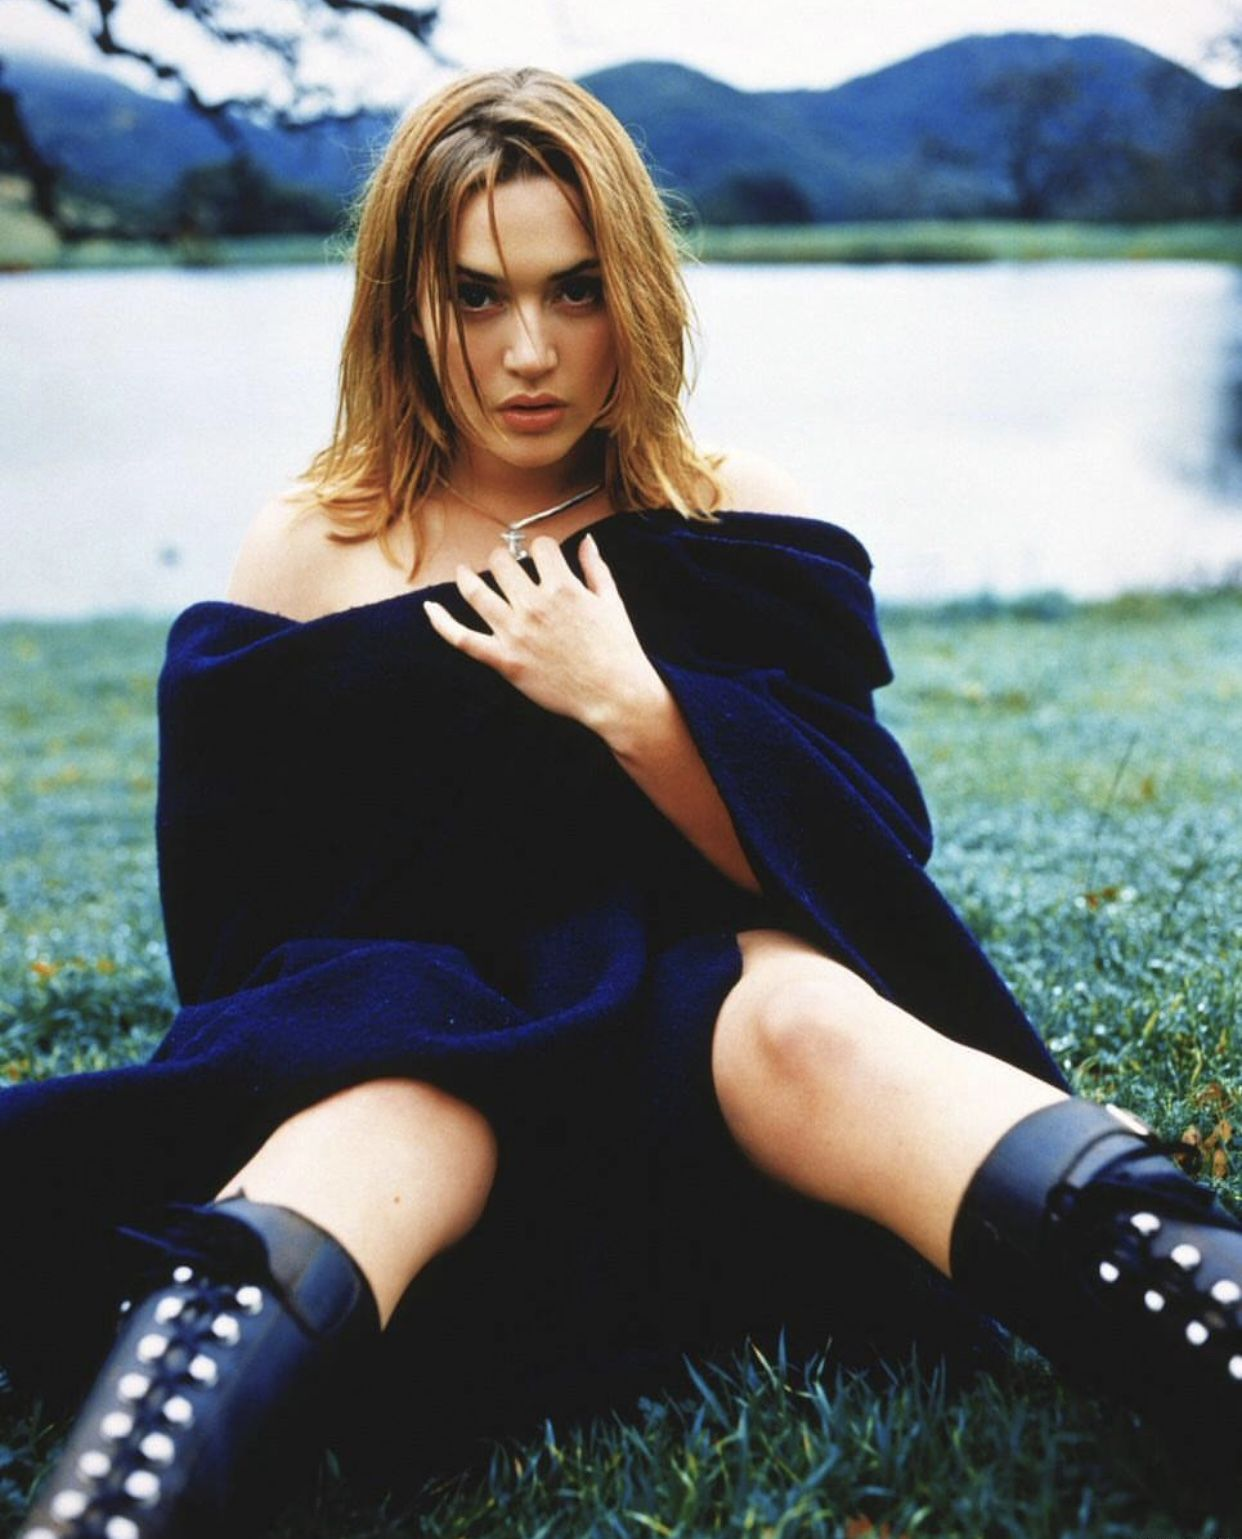 Kate Winslet Kate winslet, Kate winslate, Movie stars